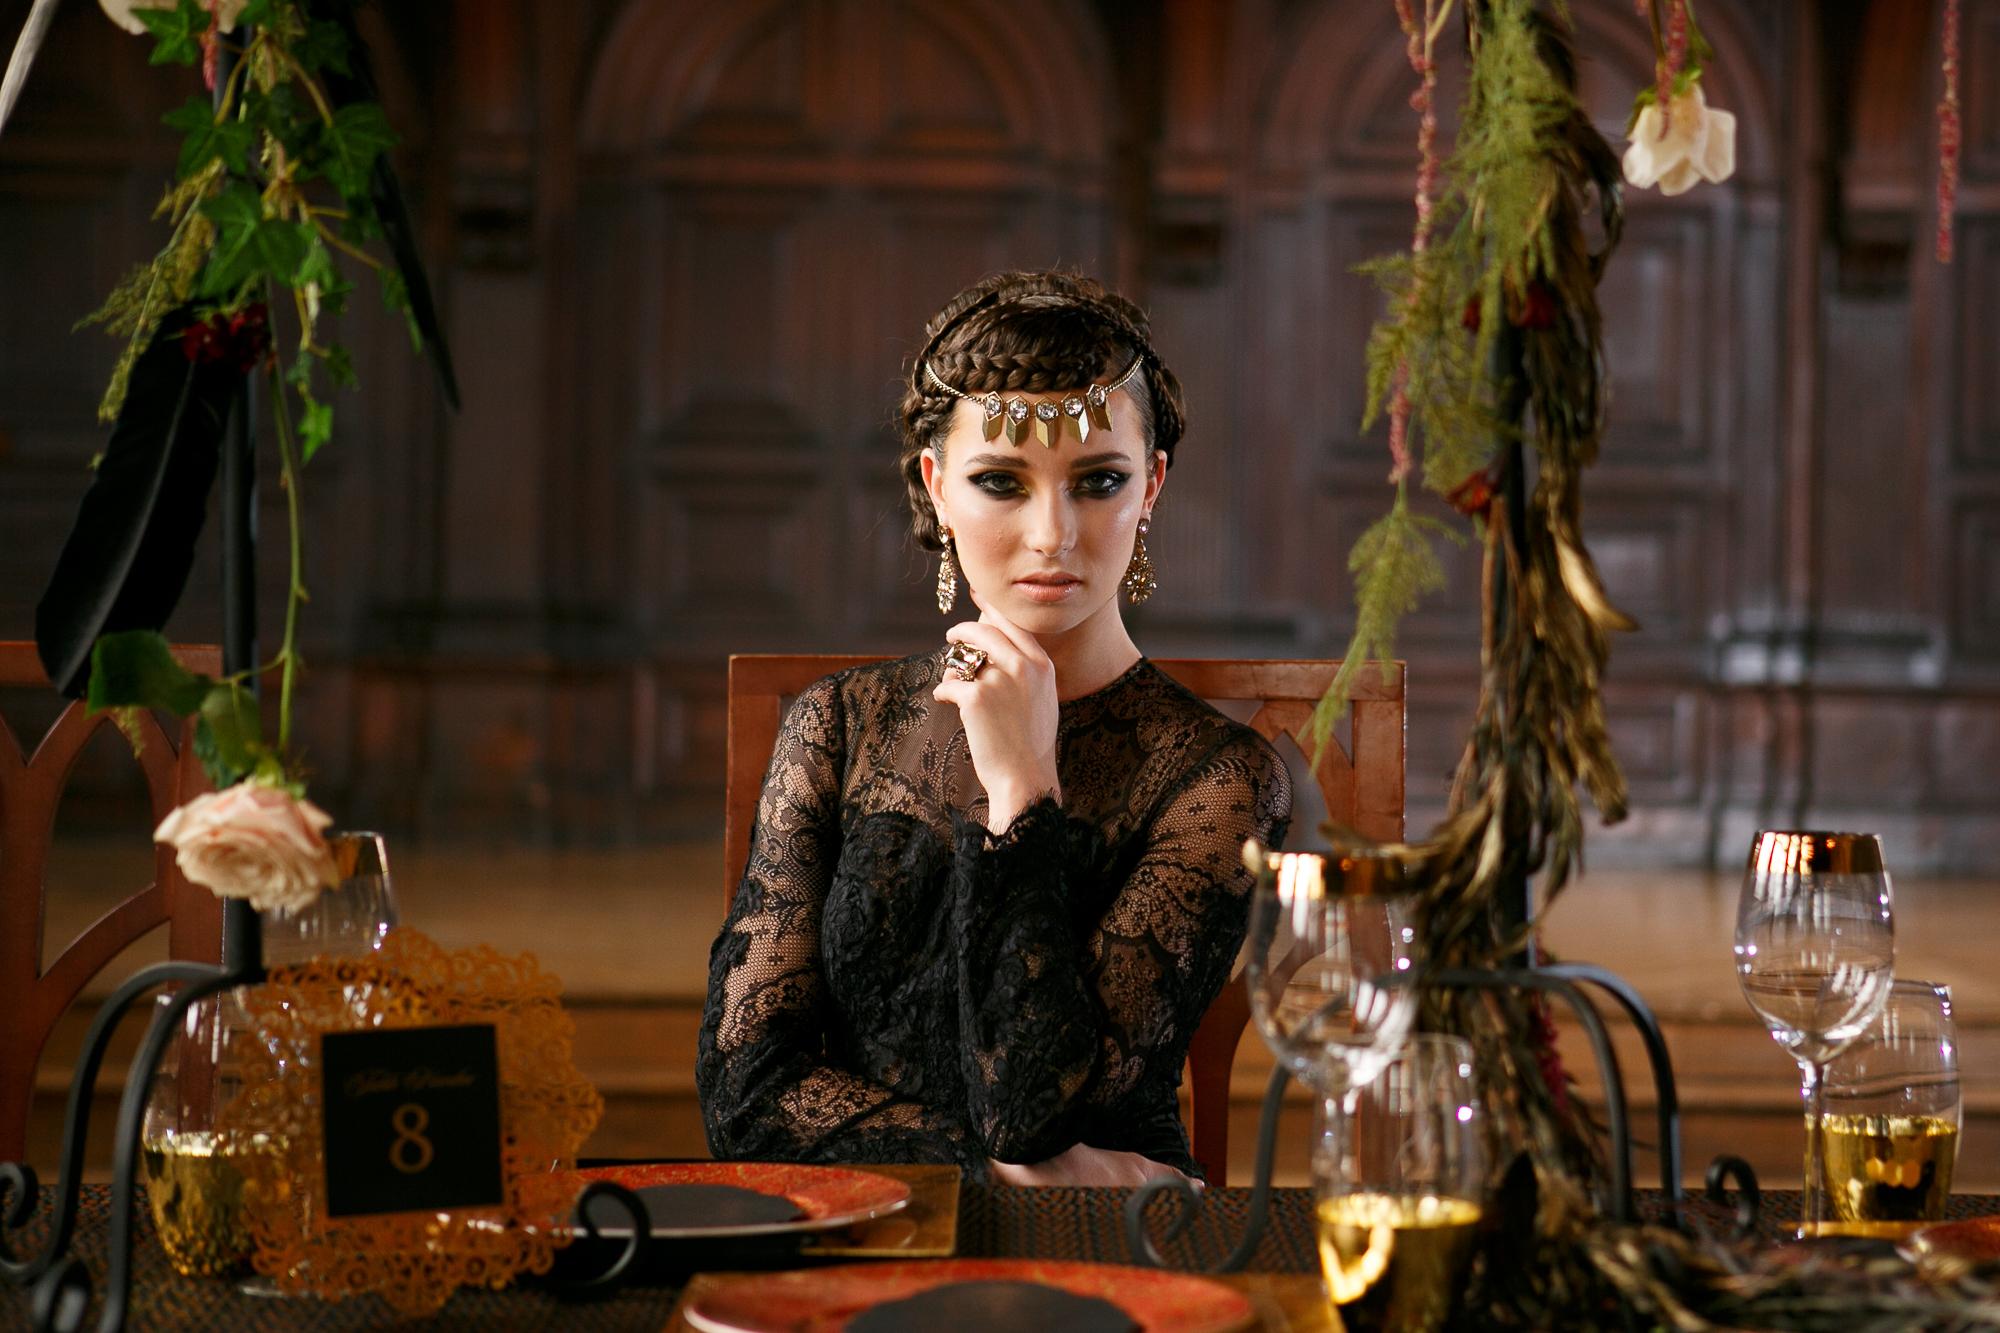 13 Black Lace Wedding Dress Evil Queen Wedding Inspiration.jpg